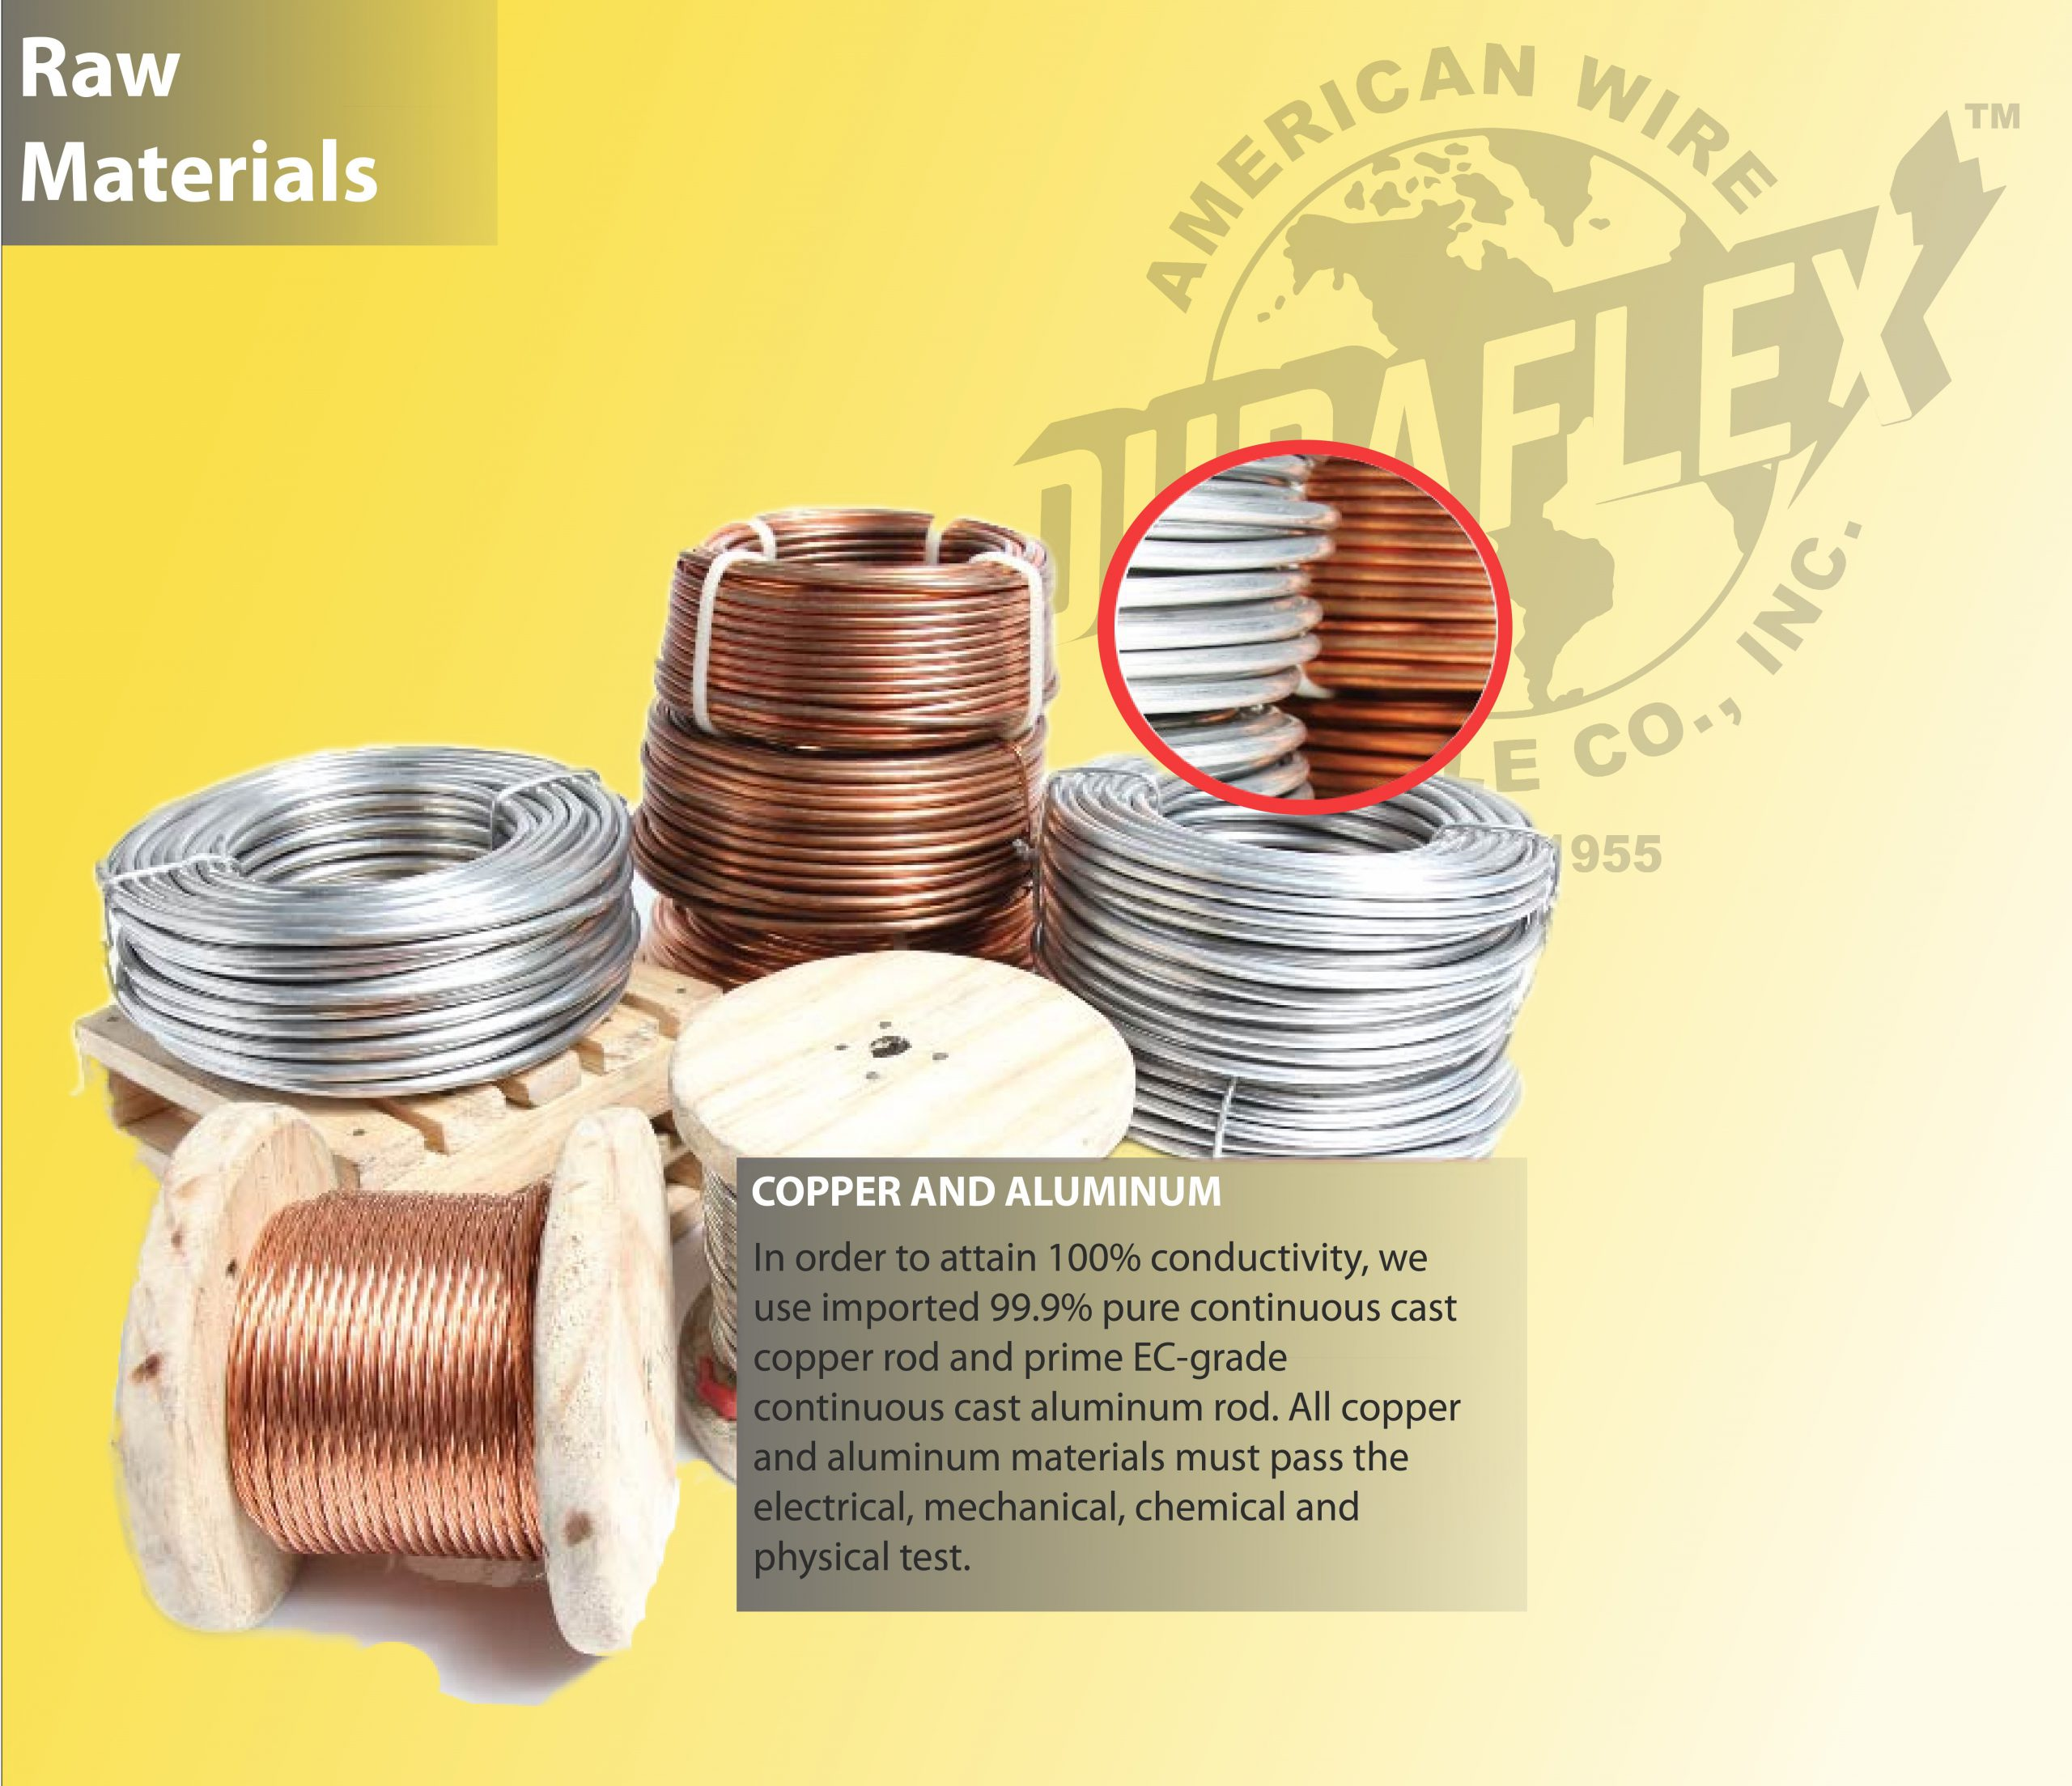 Raw Materials Copper and aluminum